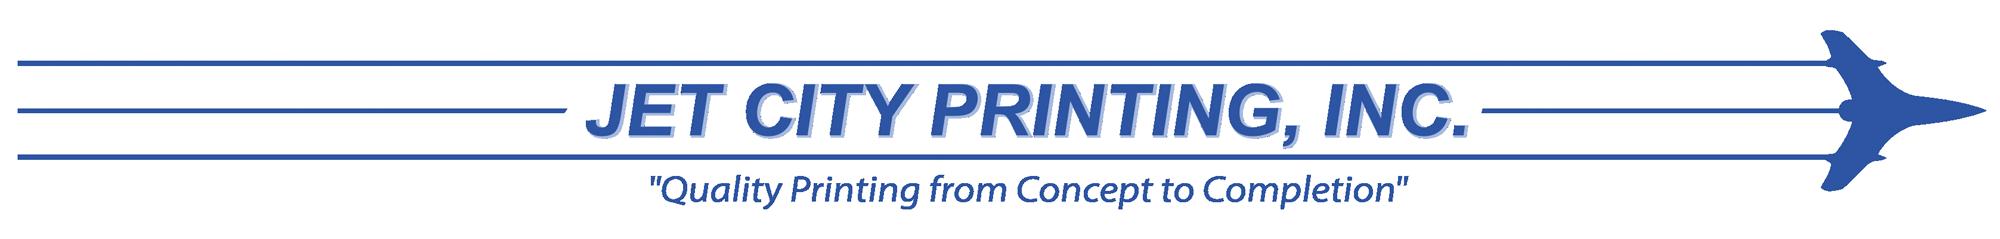 Jet City Printing